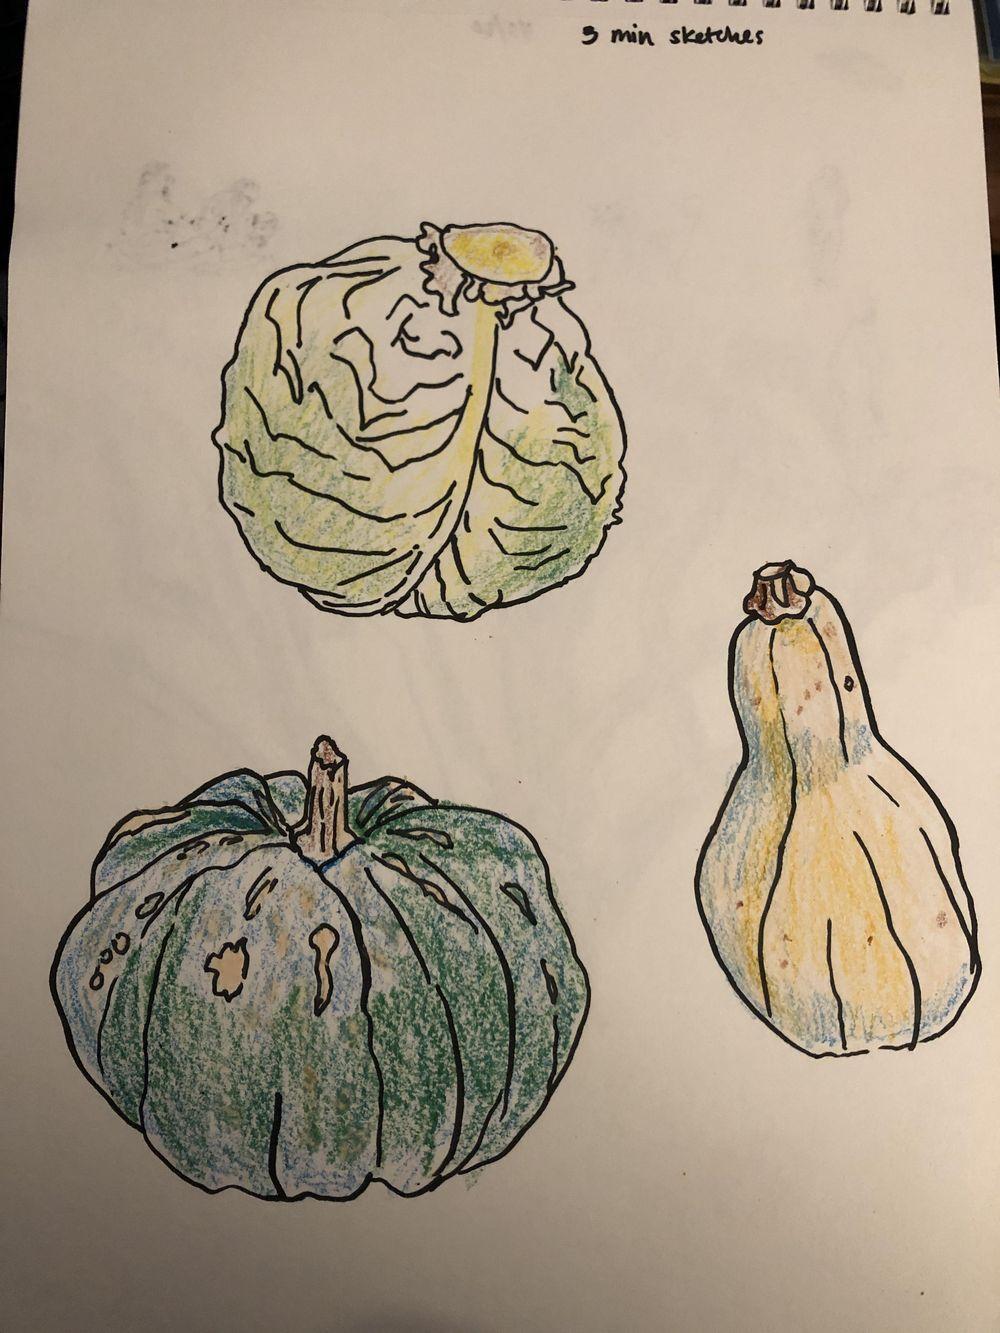 Veggies - image 2 - student project